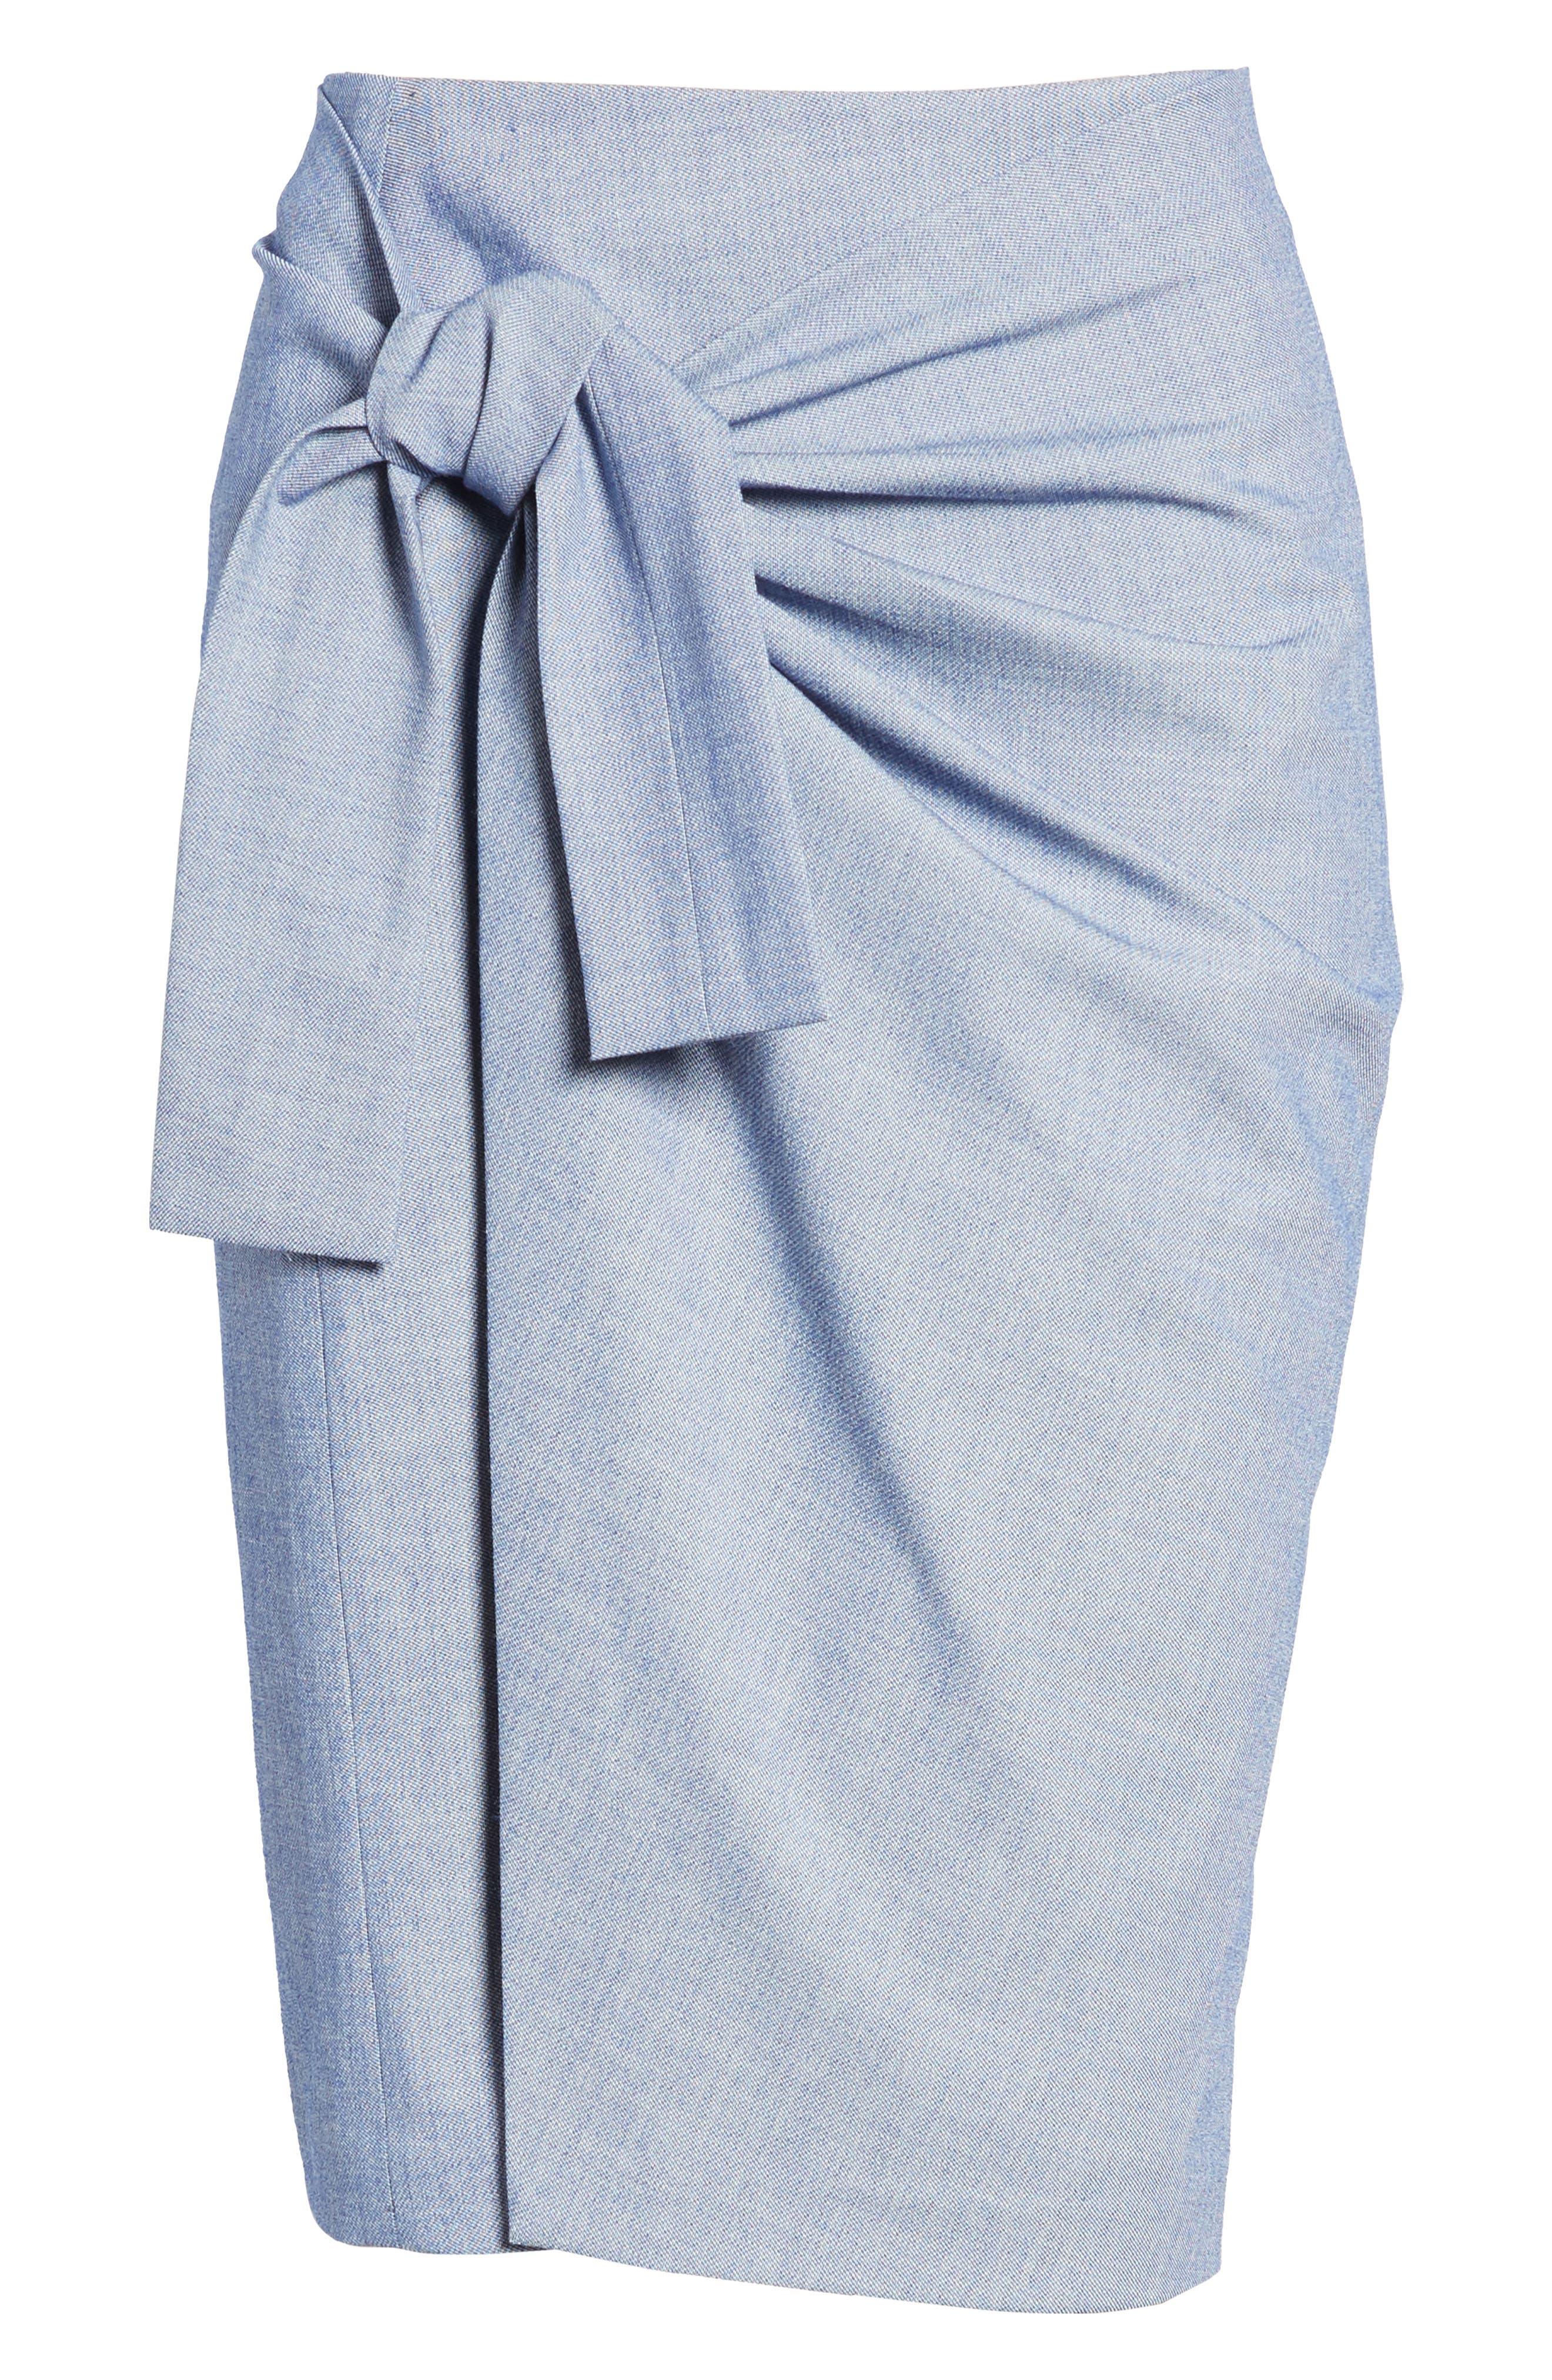 Side Tie Pencil Skirt,                             Alternate thumbnail 6, color,                             400